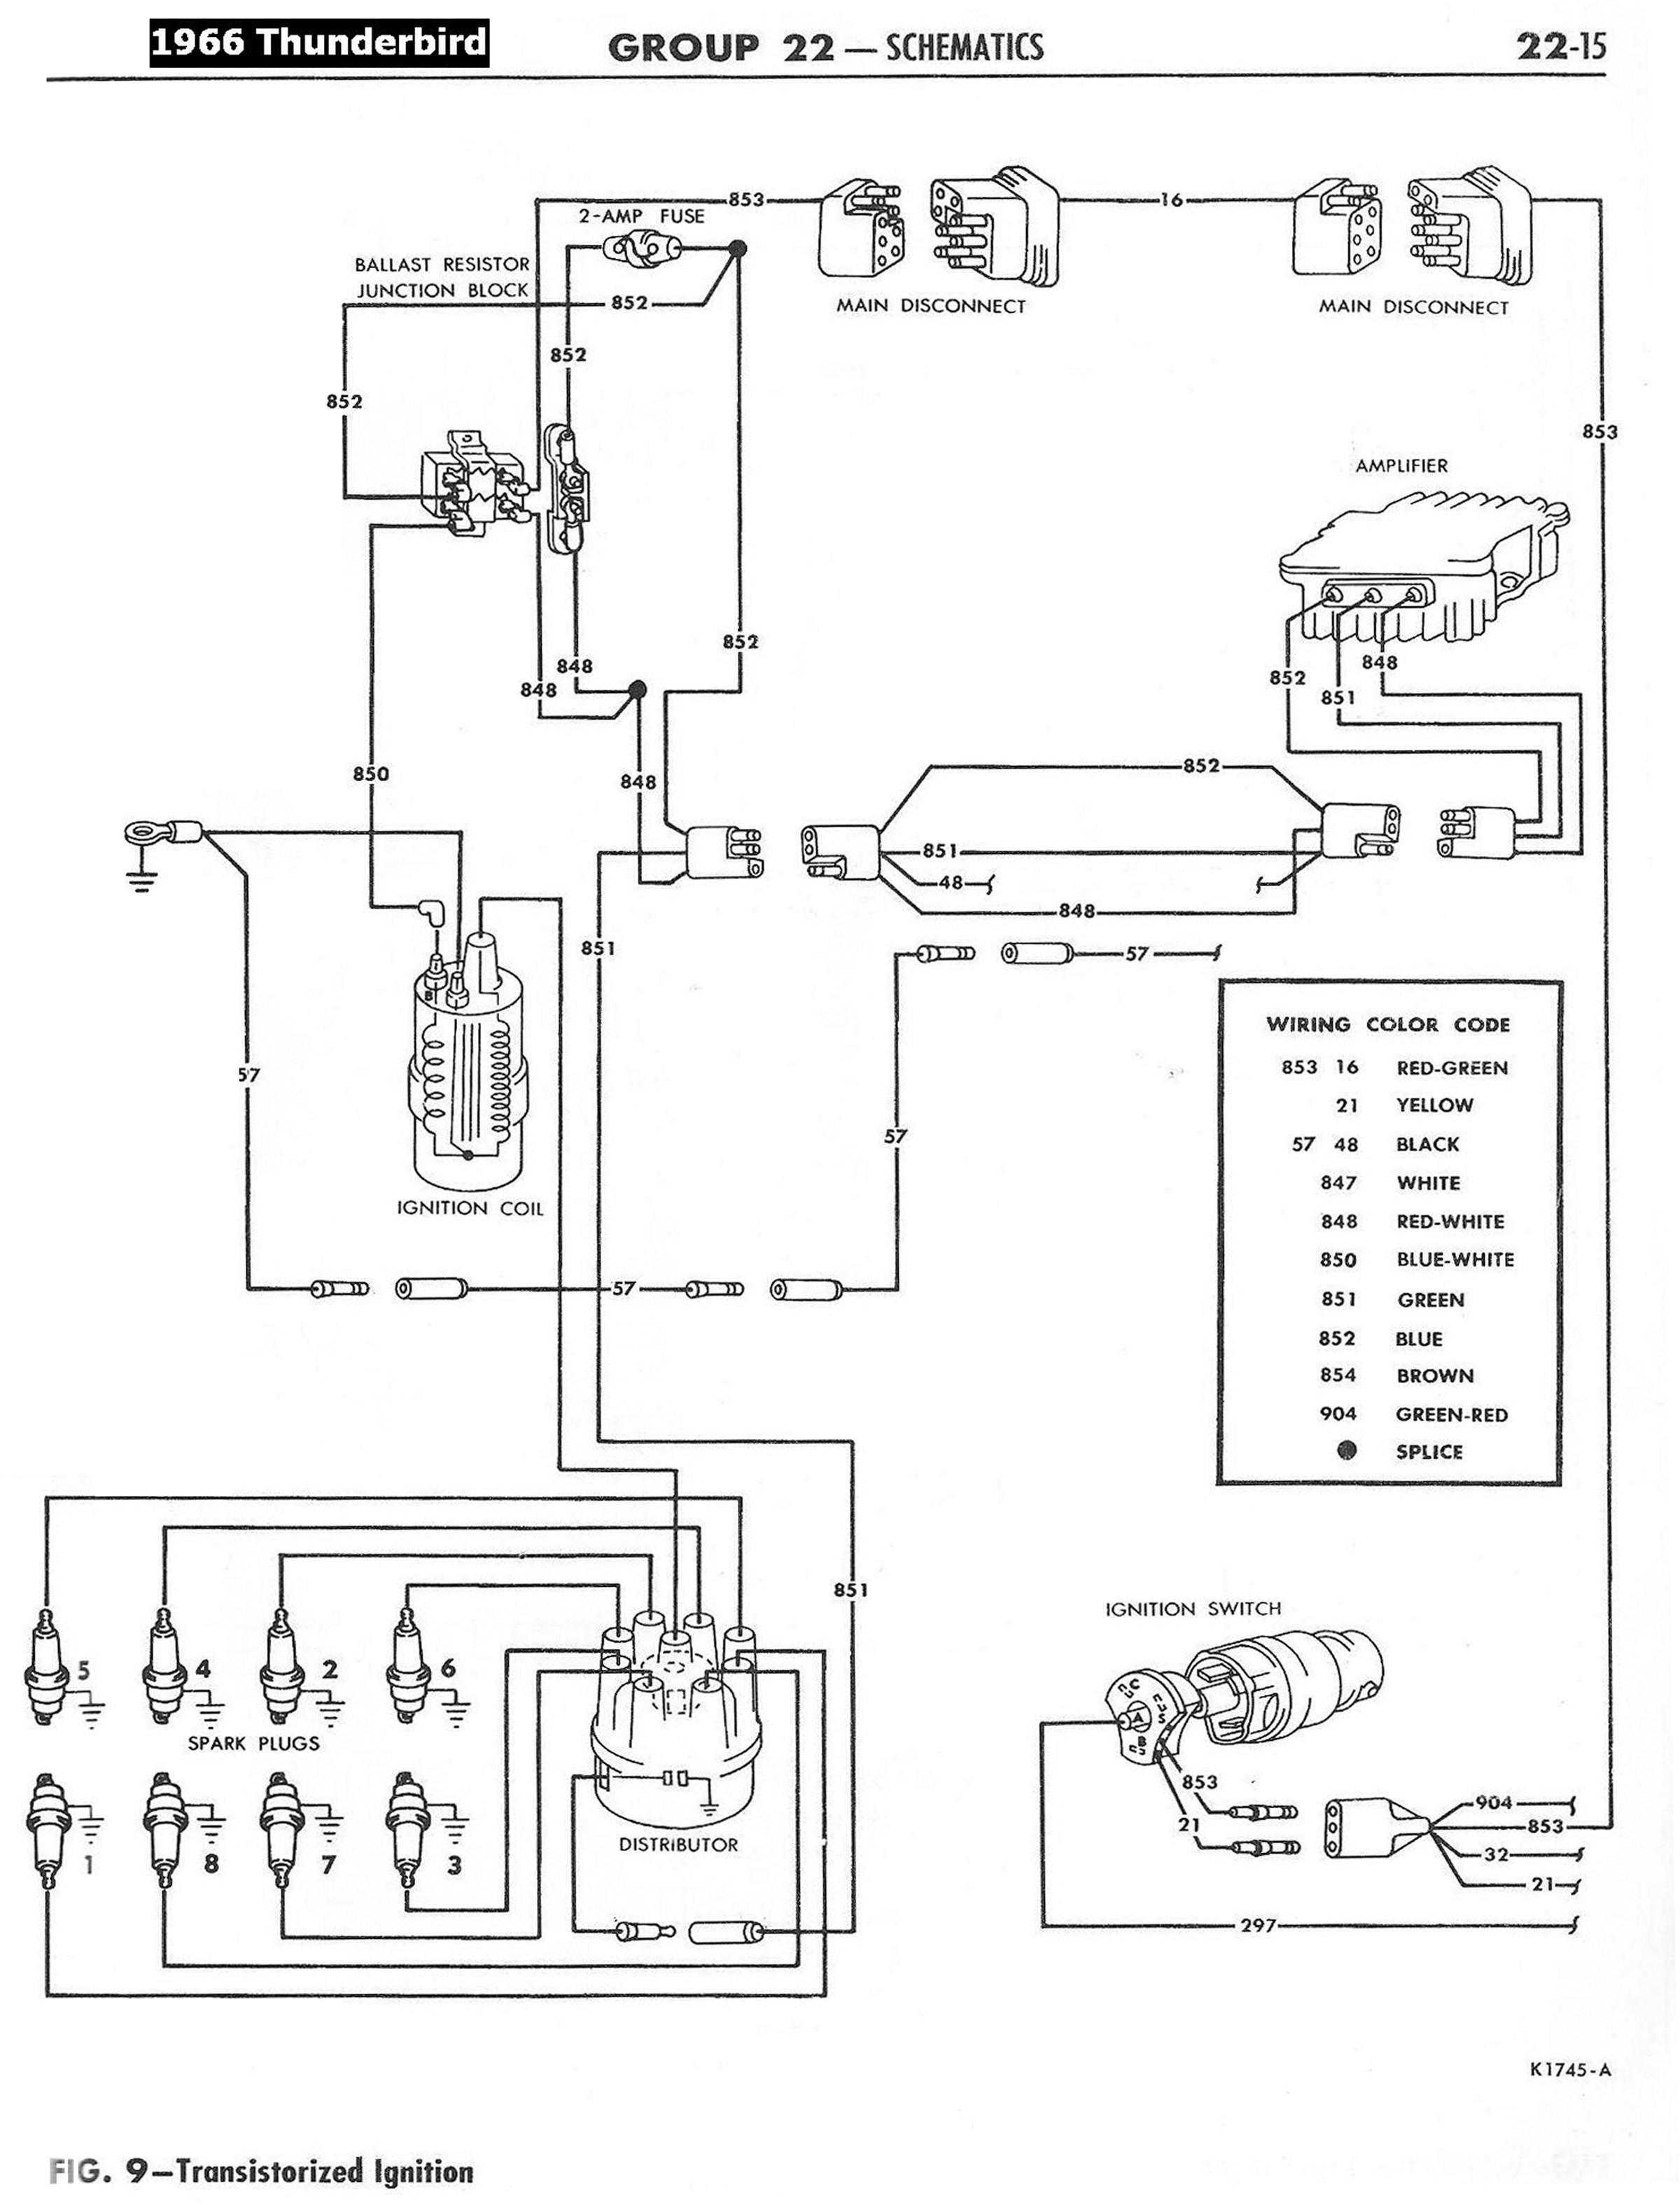 Diagram Oven Igniter Wiring Diagram Full Version Hd Quality Wiring Diagram Rackdiagram Momentidifesta It